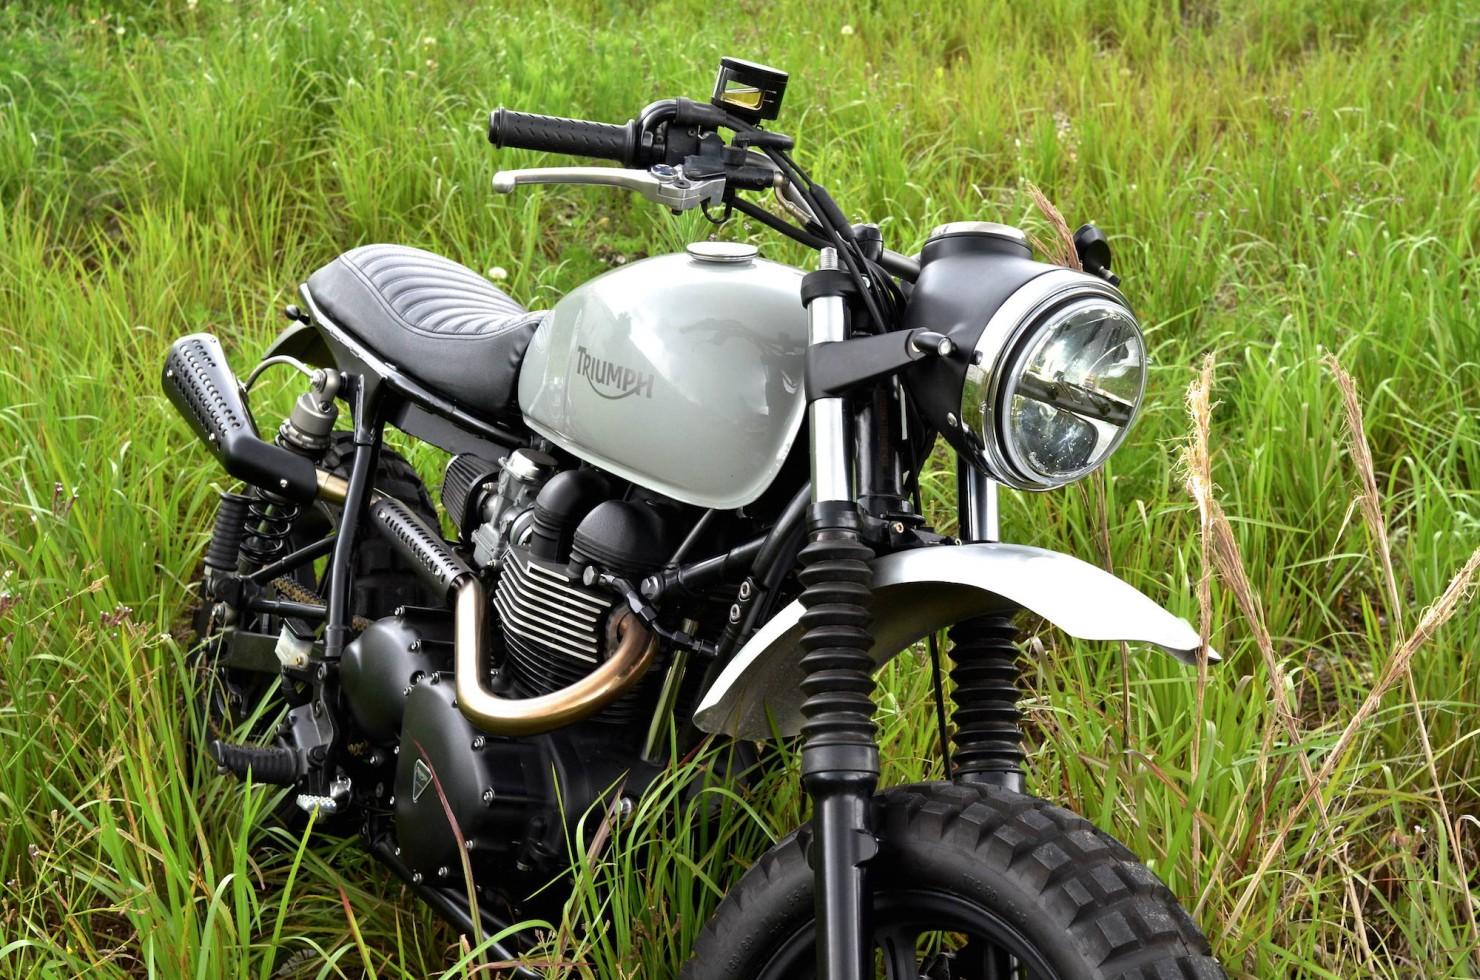 Triumph Scrambler Motorcycle 8